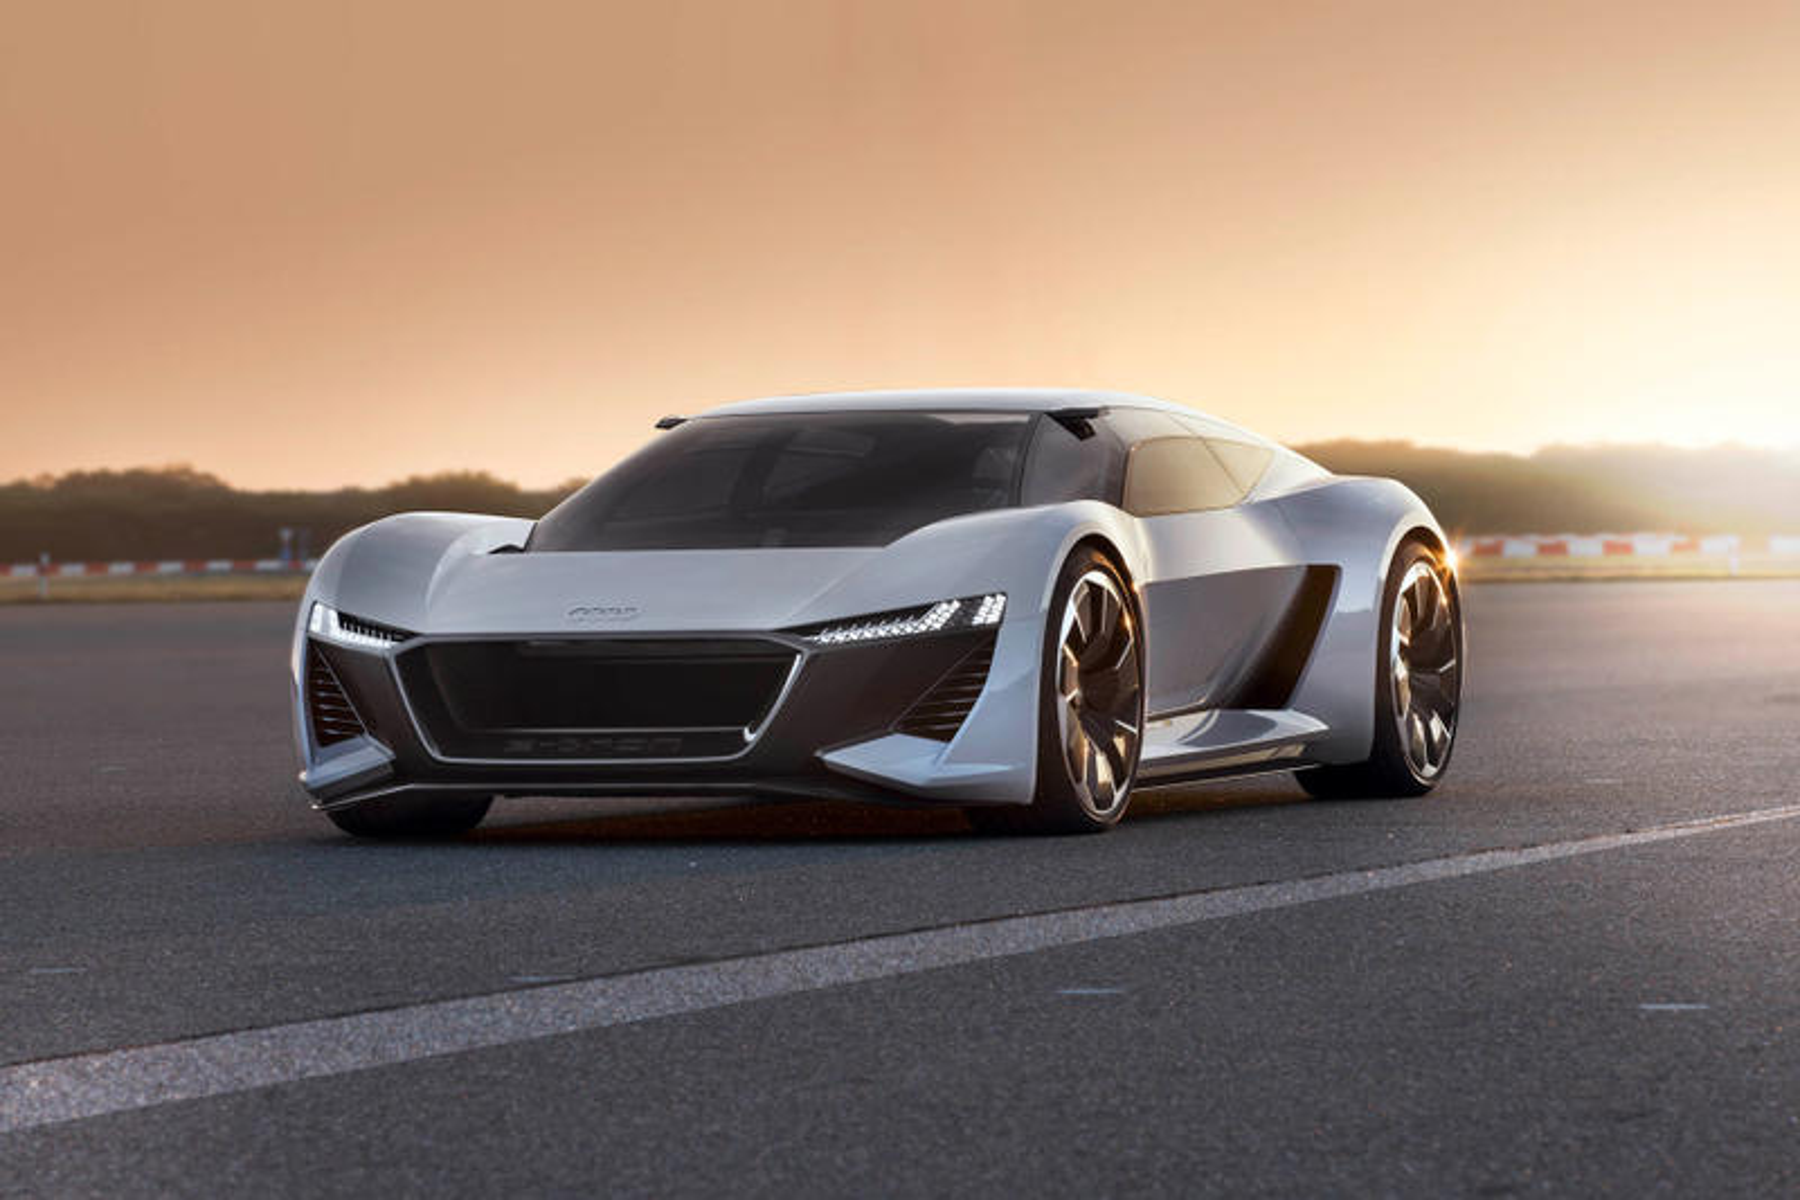 Audi's PB18 E-Tron Electric Supercar Features a Center-Positioned Seat